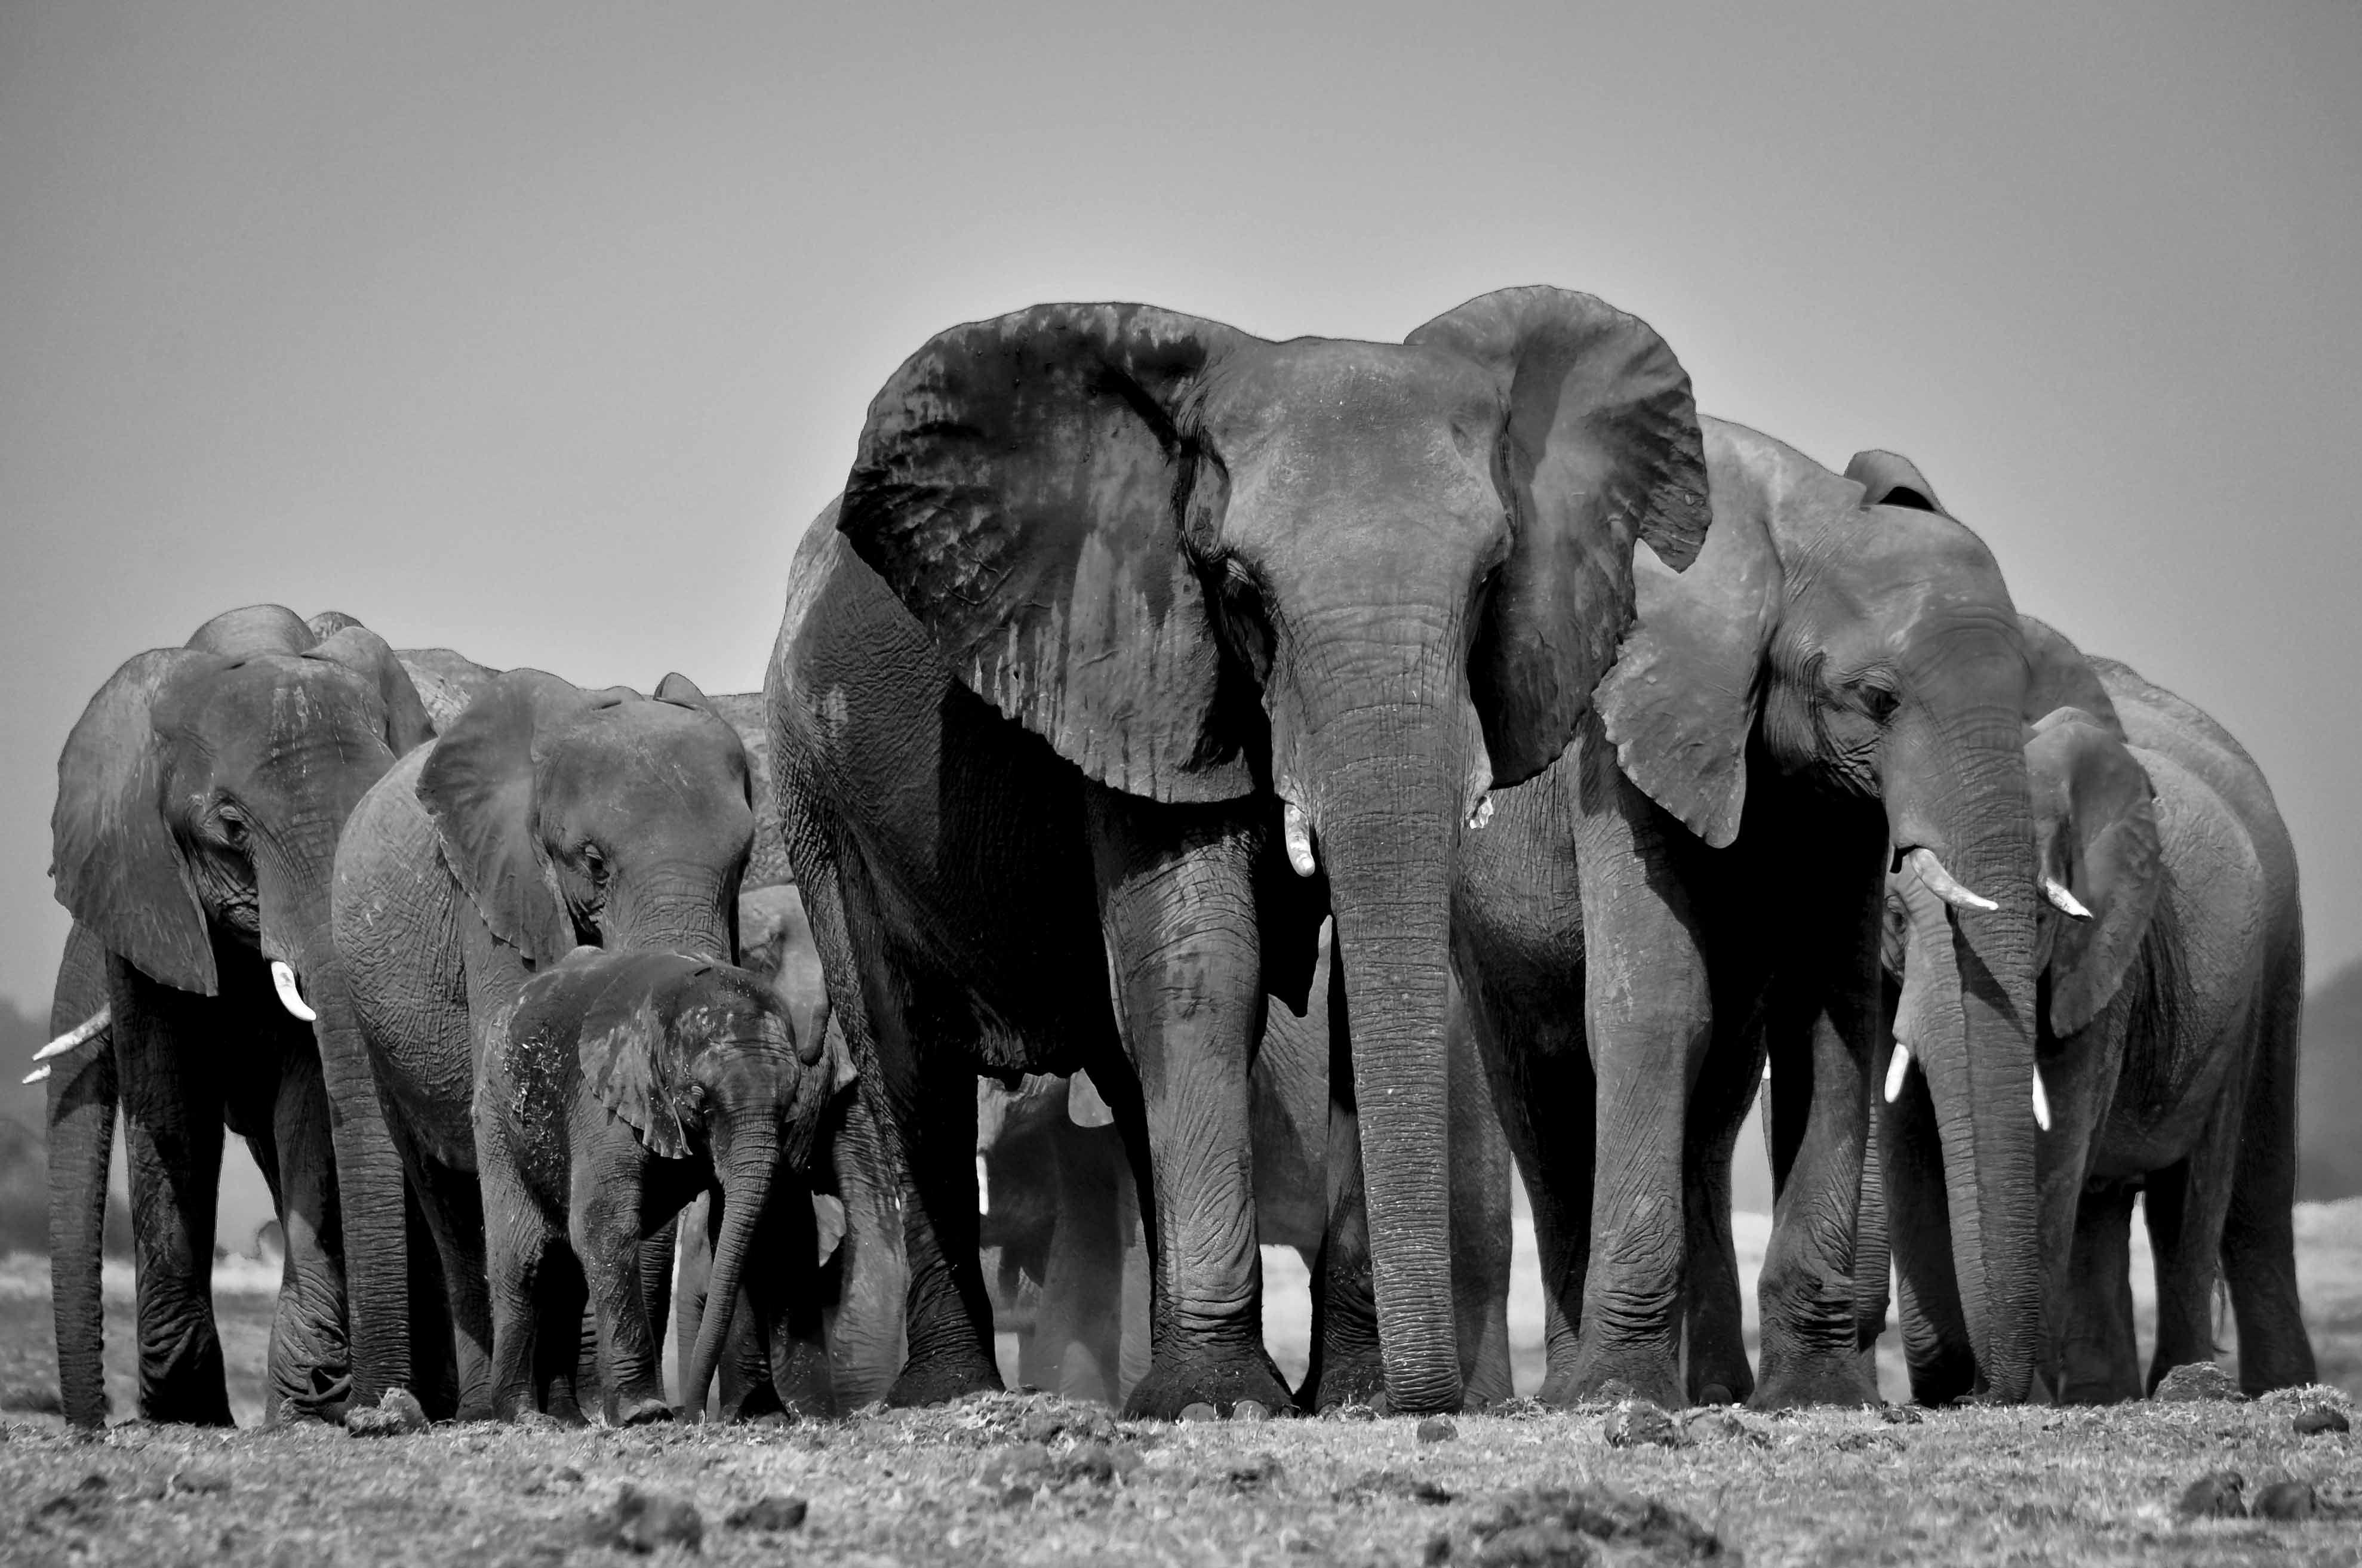 elephants black and white Google Search Elephant